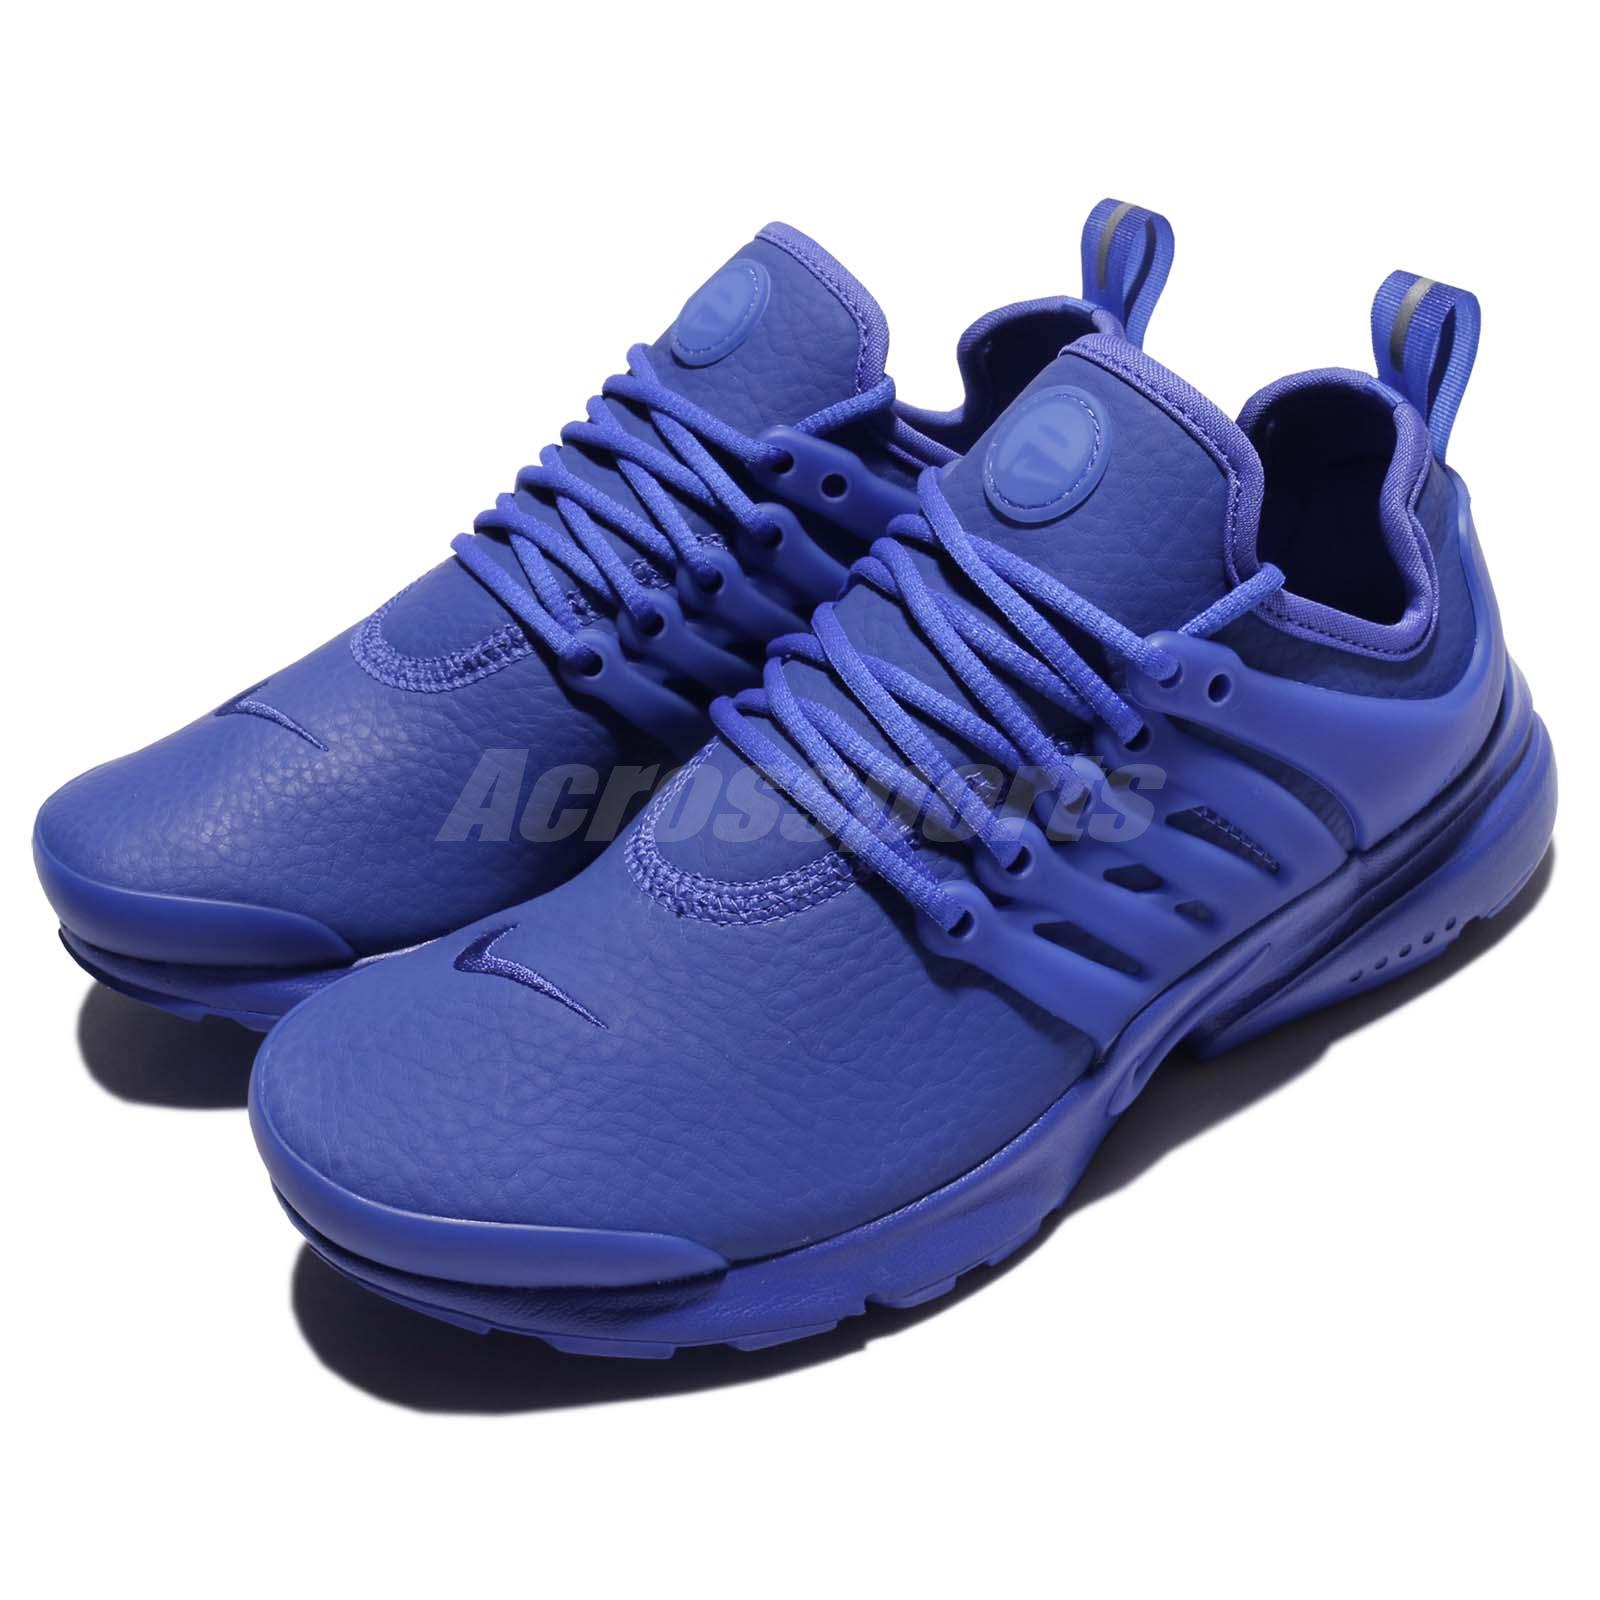 brand new ec1ec faafe Details about Nike Wmns Air Presto PRM Triple Paramount Blue Leather Women  Shoe 878071-401